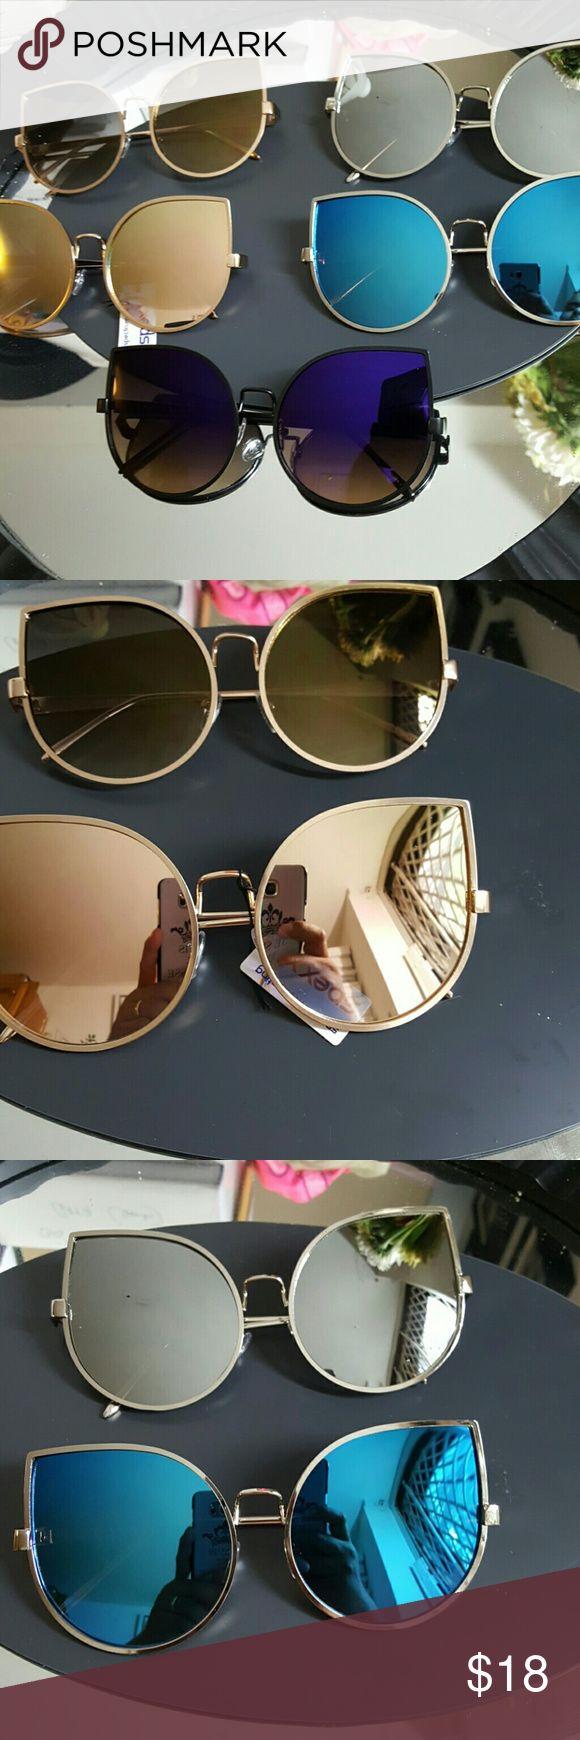 CAT STYLE OVERSIZE WOMAN SUNGLASSES CAT STYLE OVERSIZE WOMAN SUNGLASSES Accessories Sunglasses